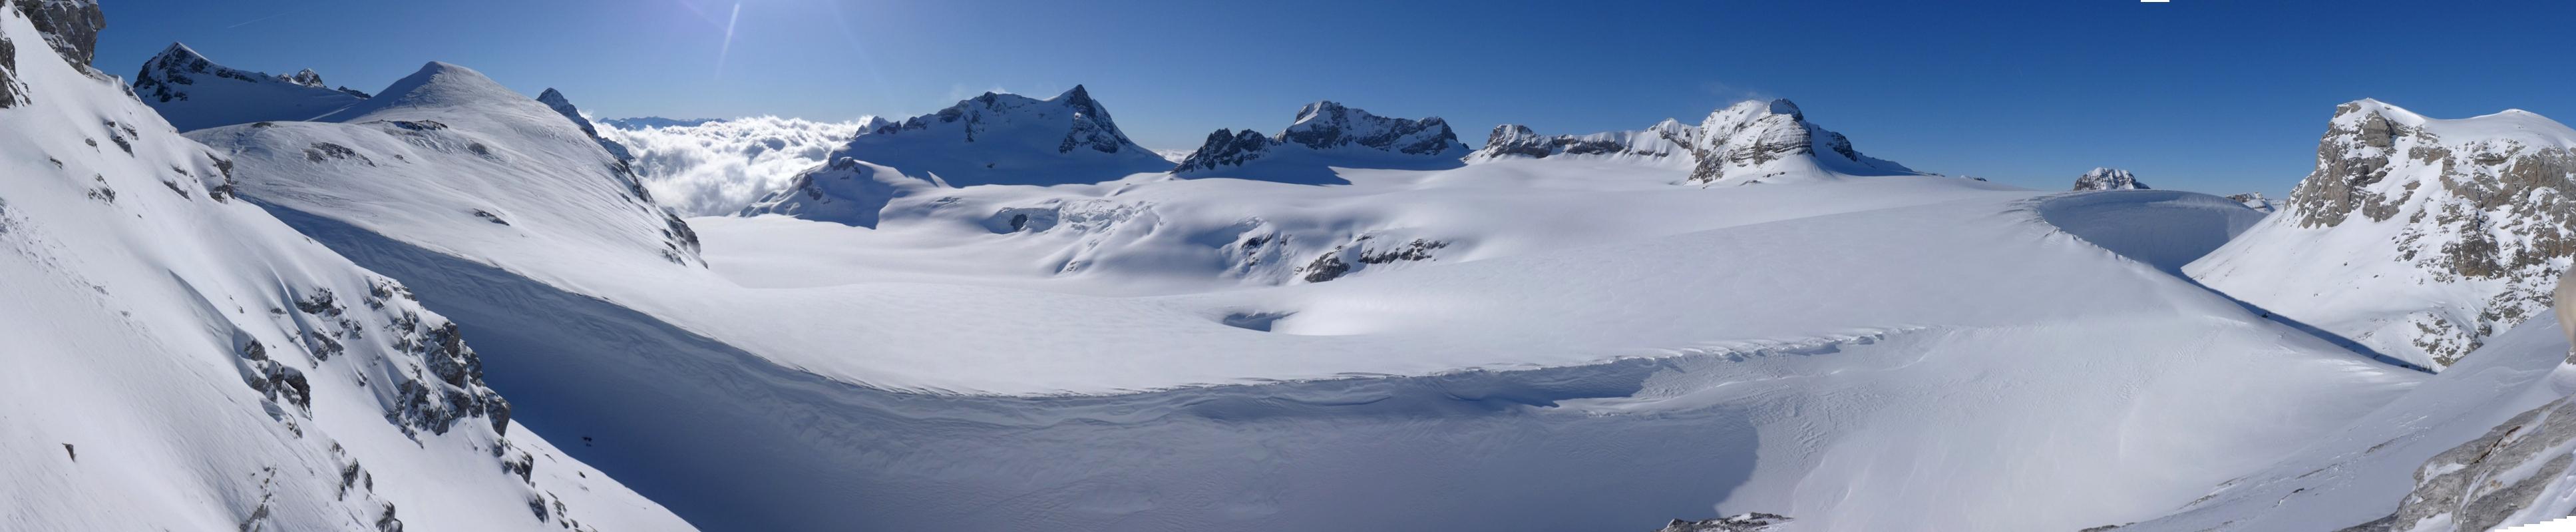 Planurahütte Glarner Alpen Schweiz panorama 40